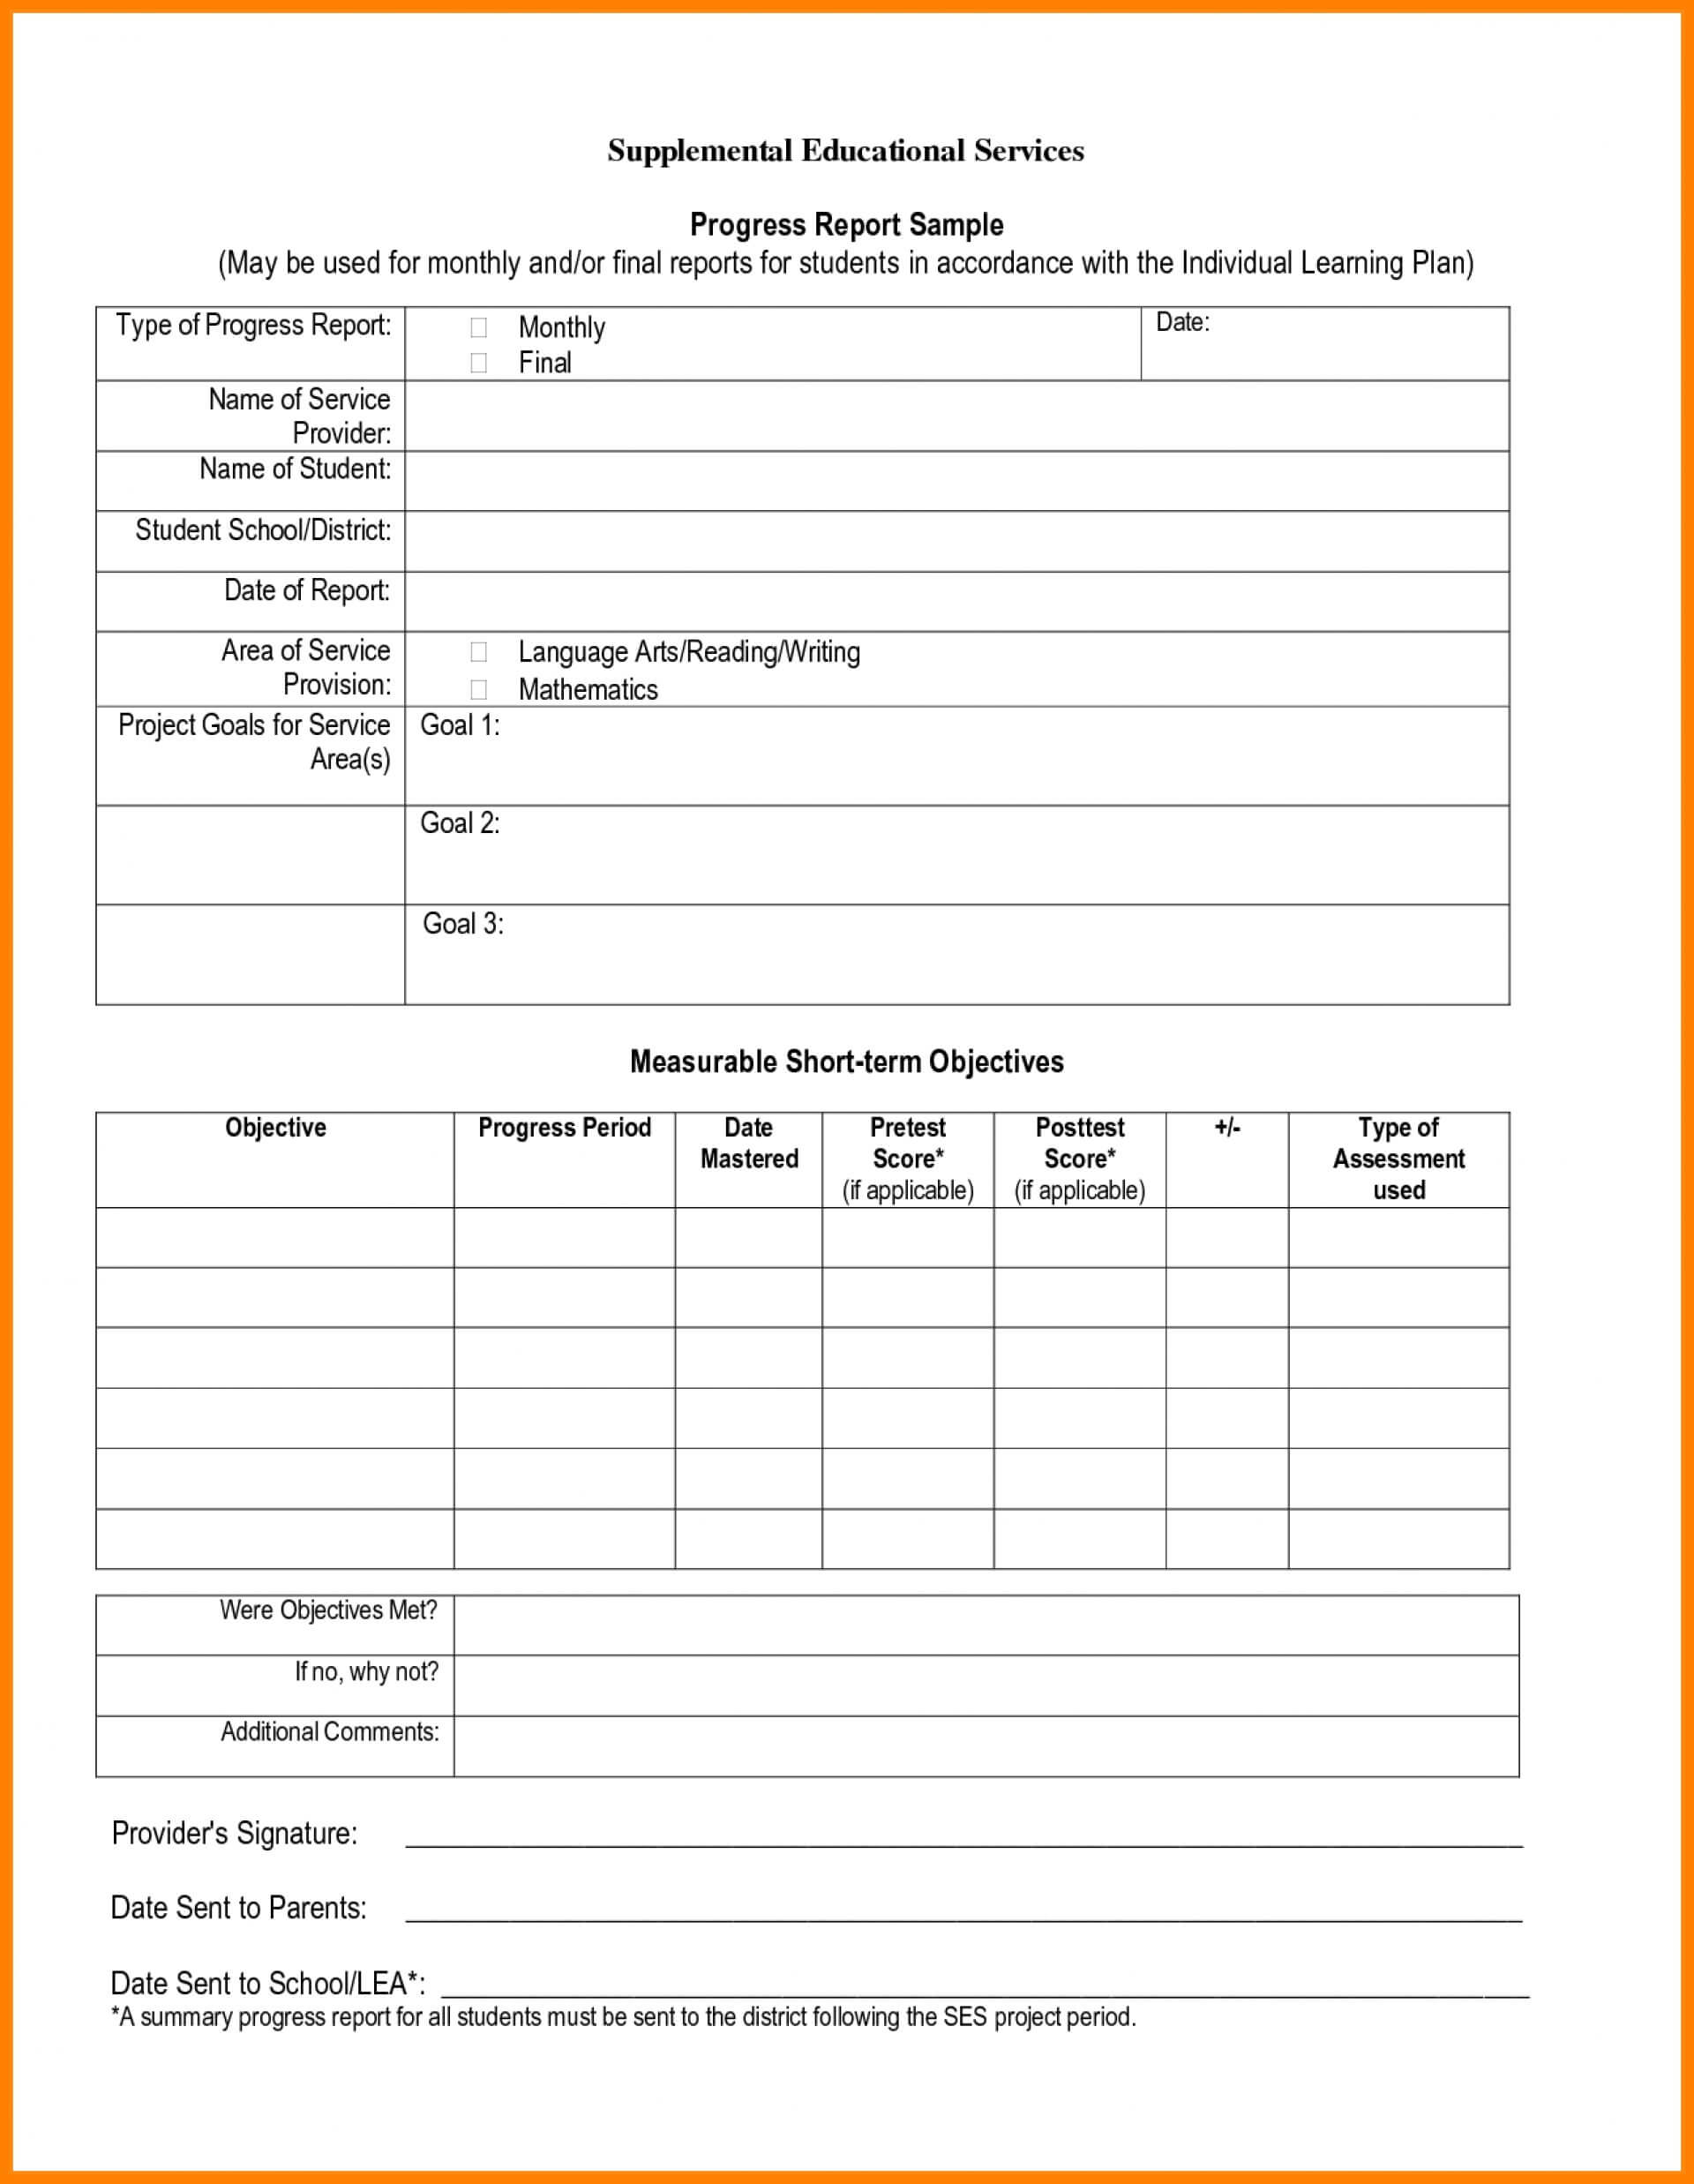 028 Student Progress Report Template Ideas Daily Beautiful with regard to Summer School Progress Report Template